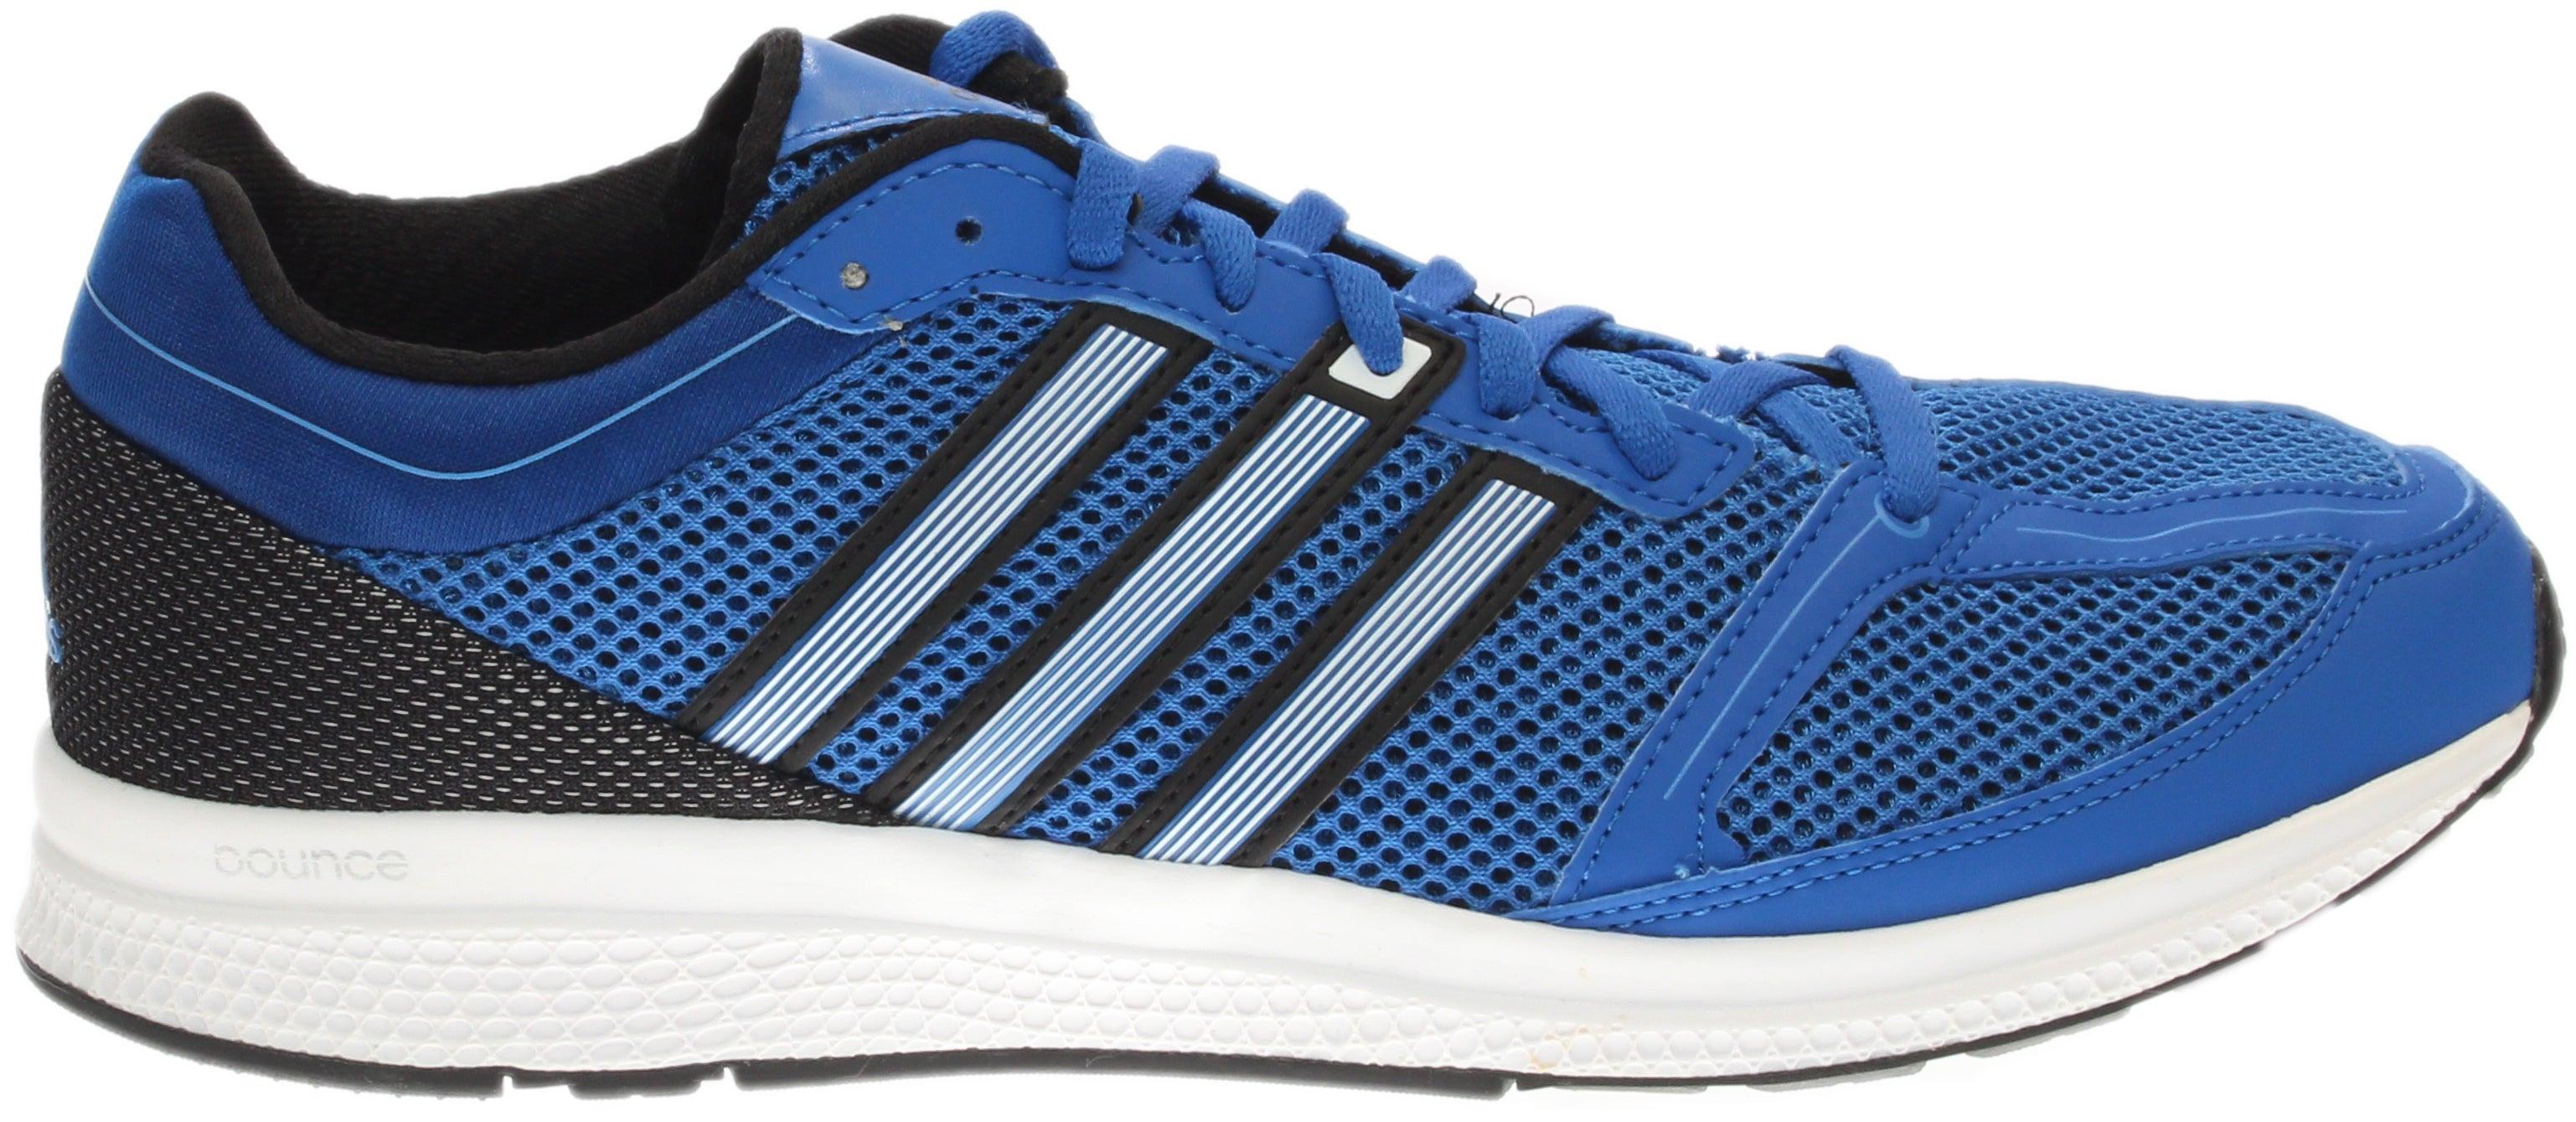 adidas Mana RC Bounce Blue - Mens  - Size